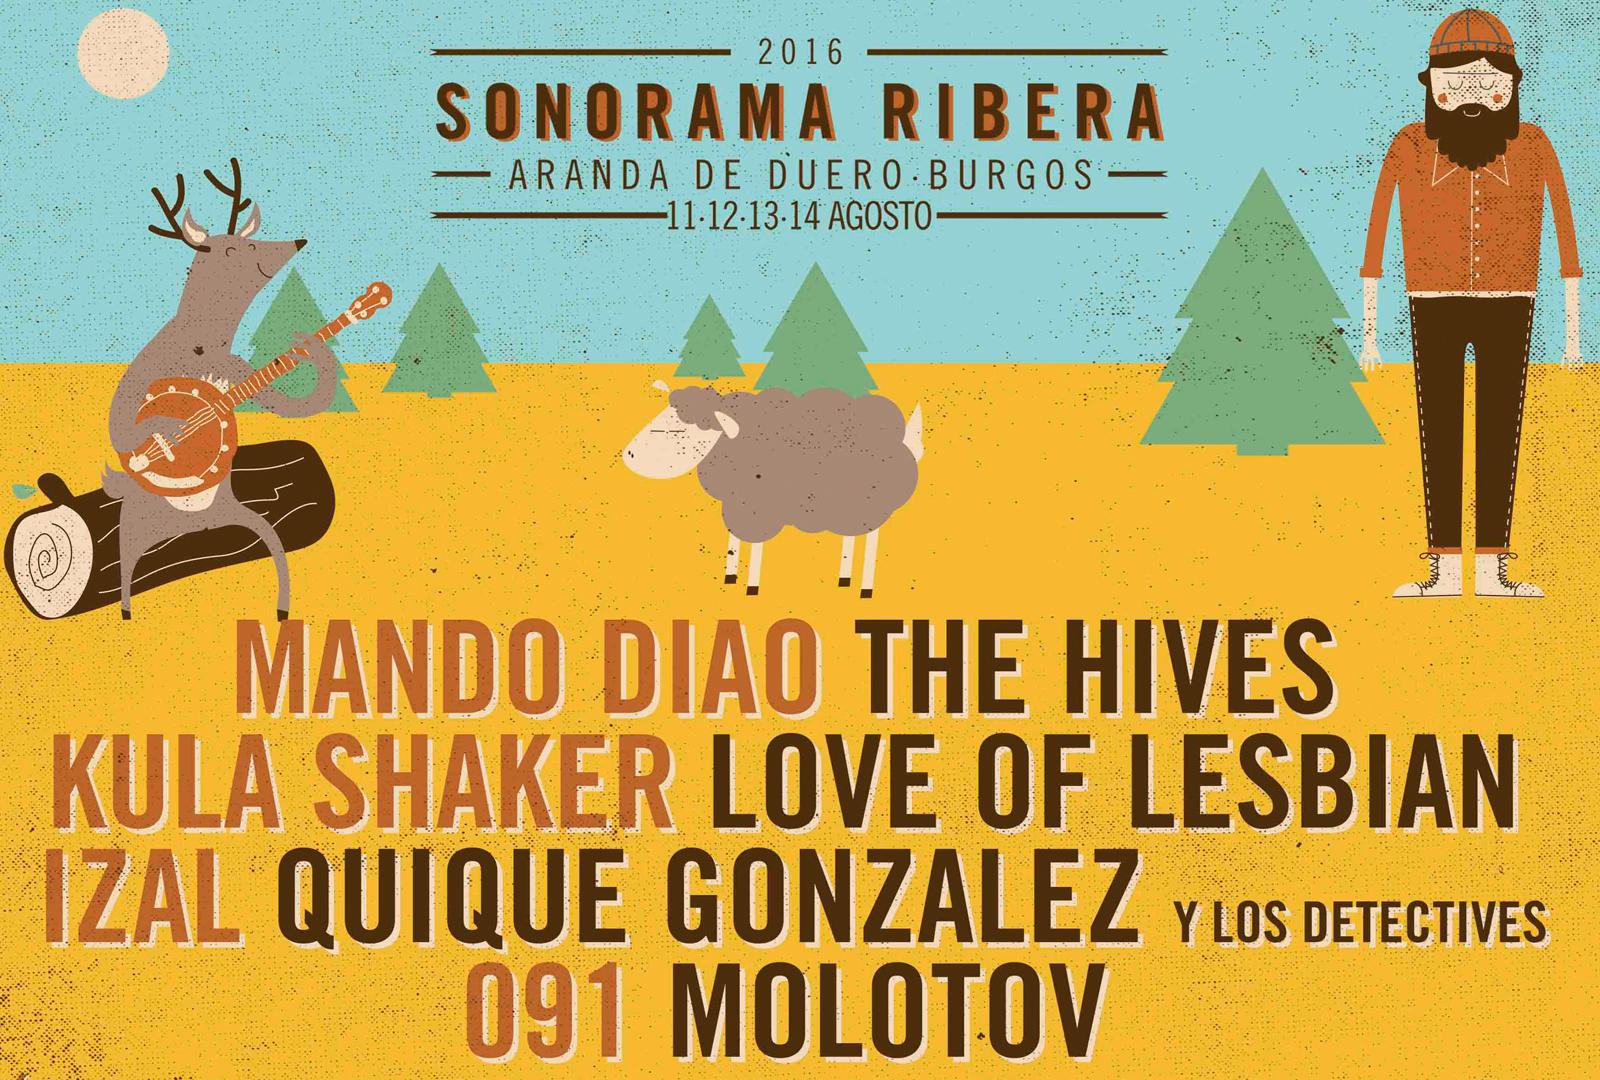 Sonorama Ribera 2016, diseña su camiseta.